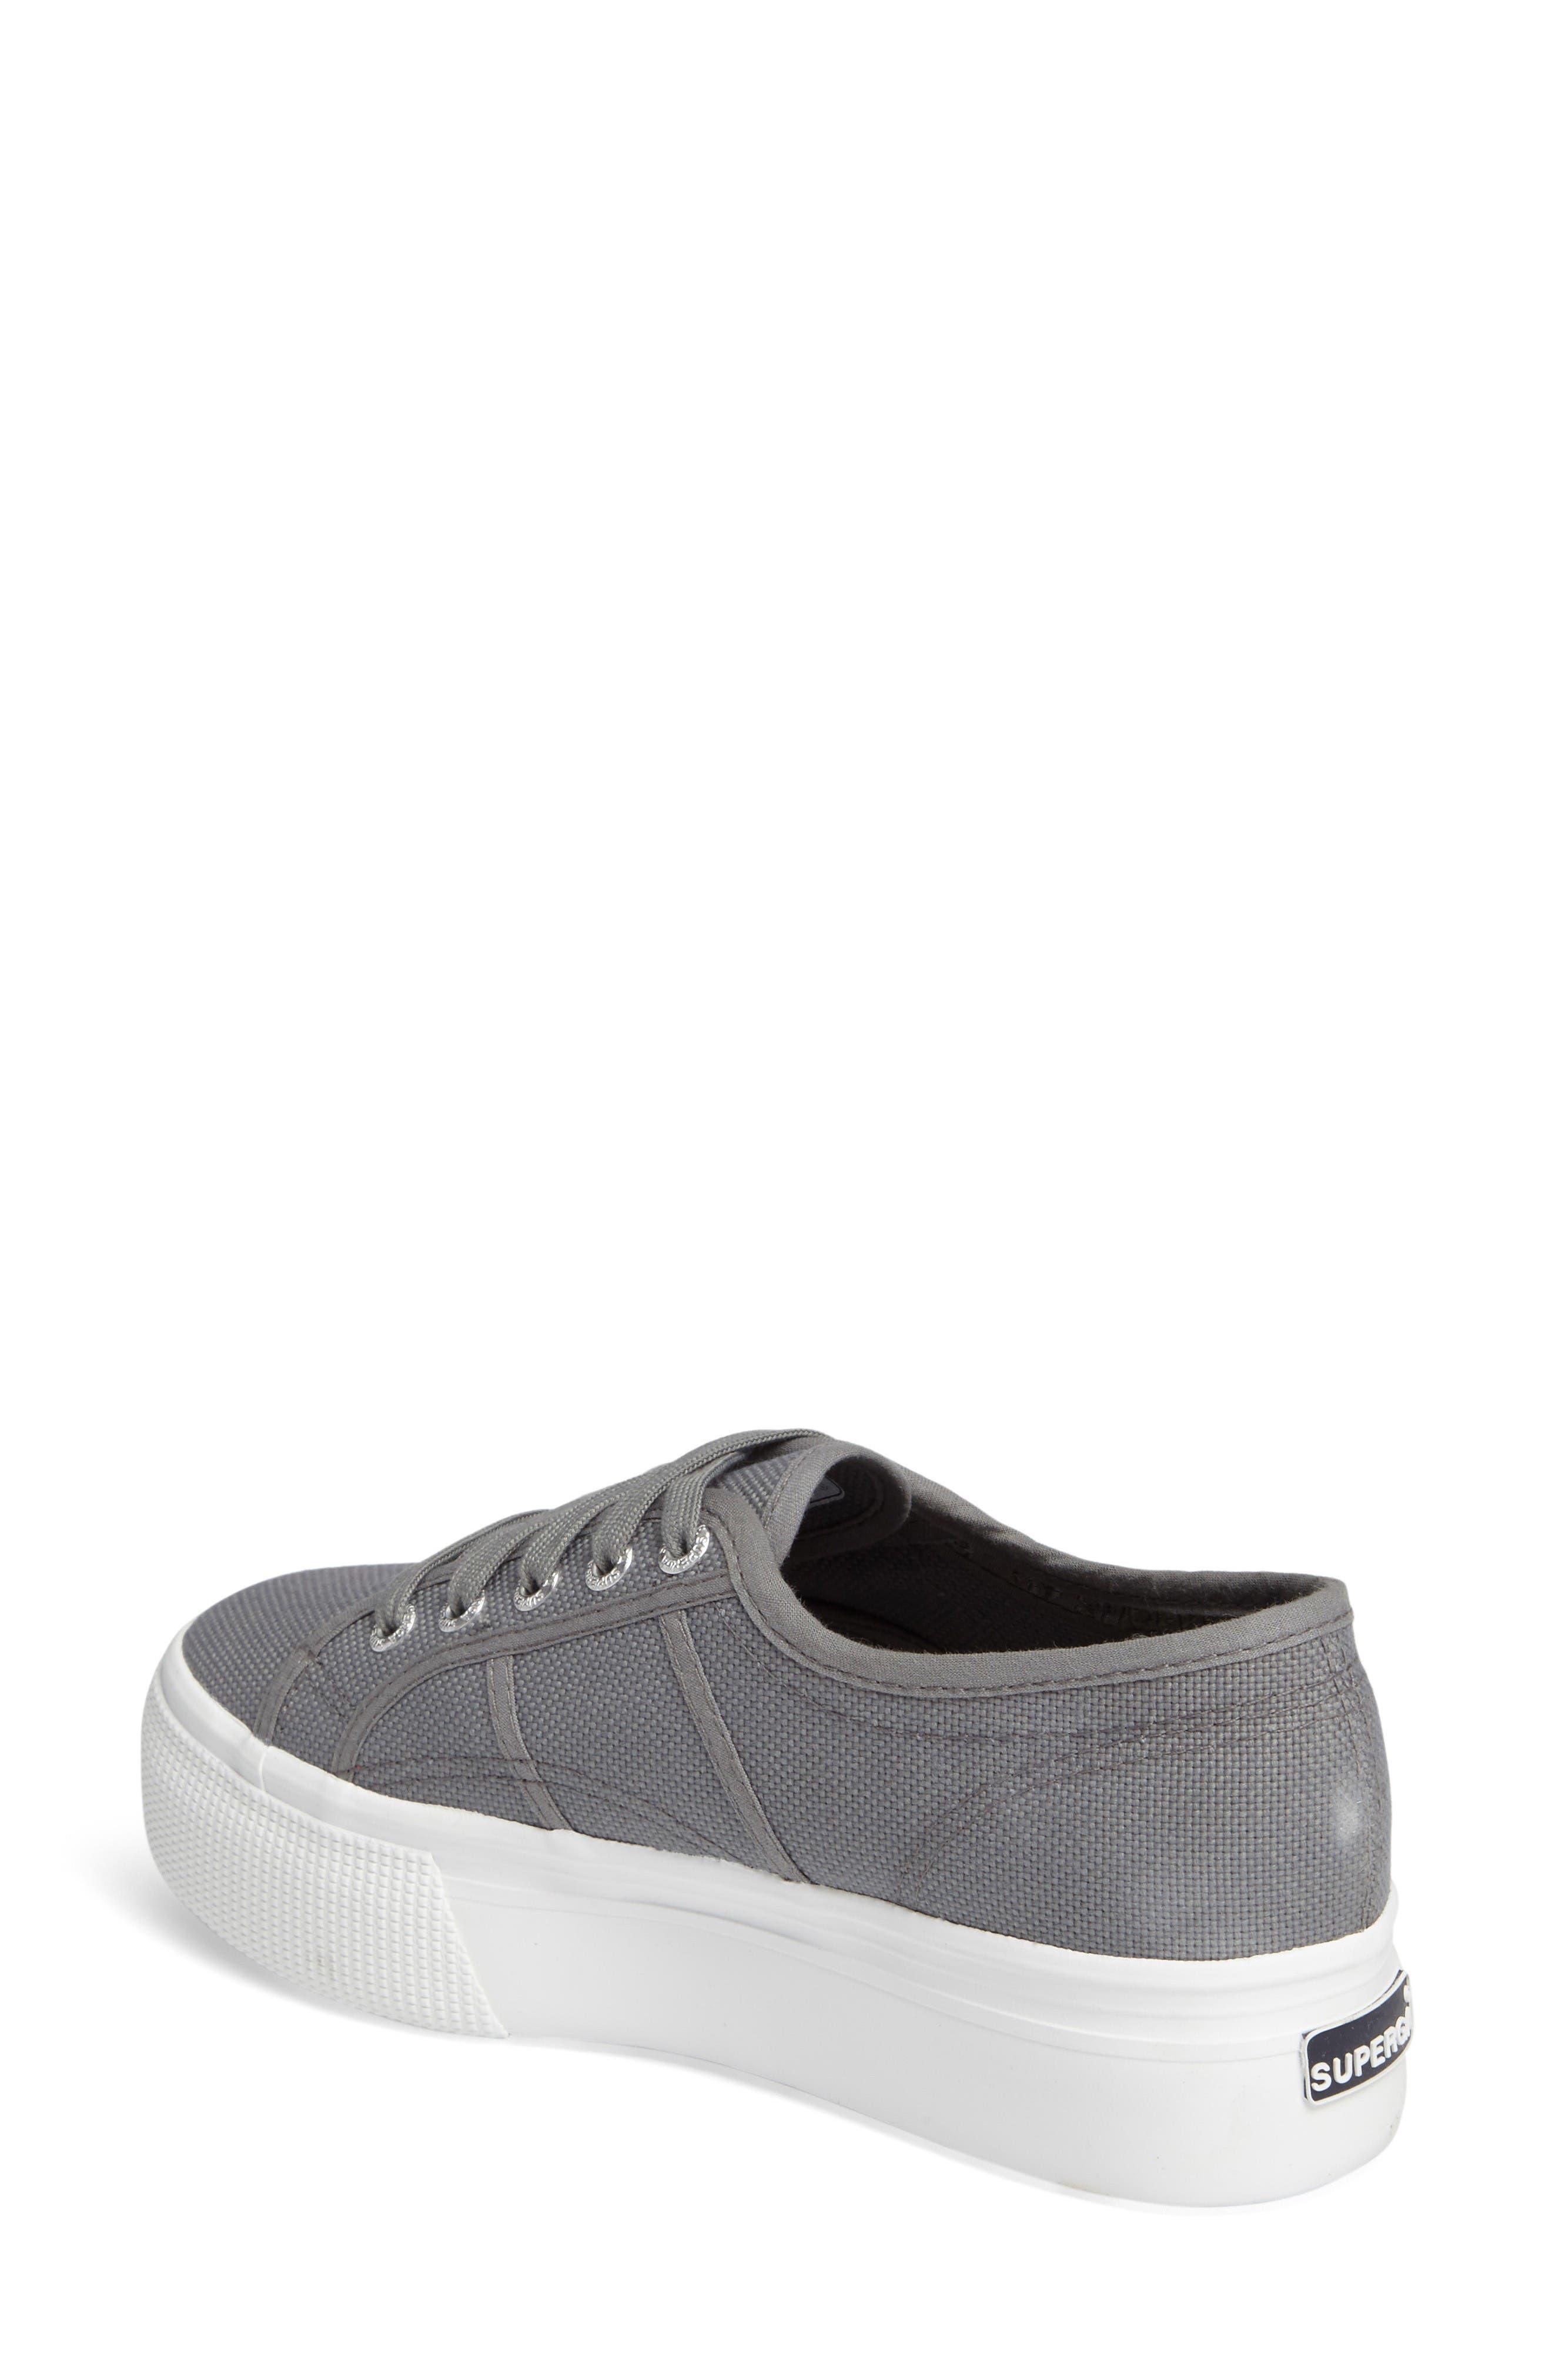 eb87375edba Superga Shoes   Sneakers